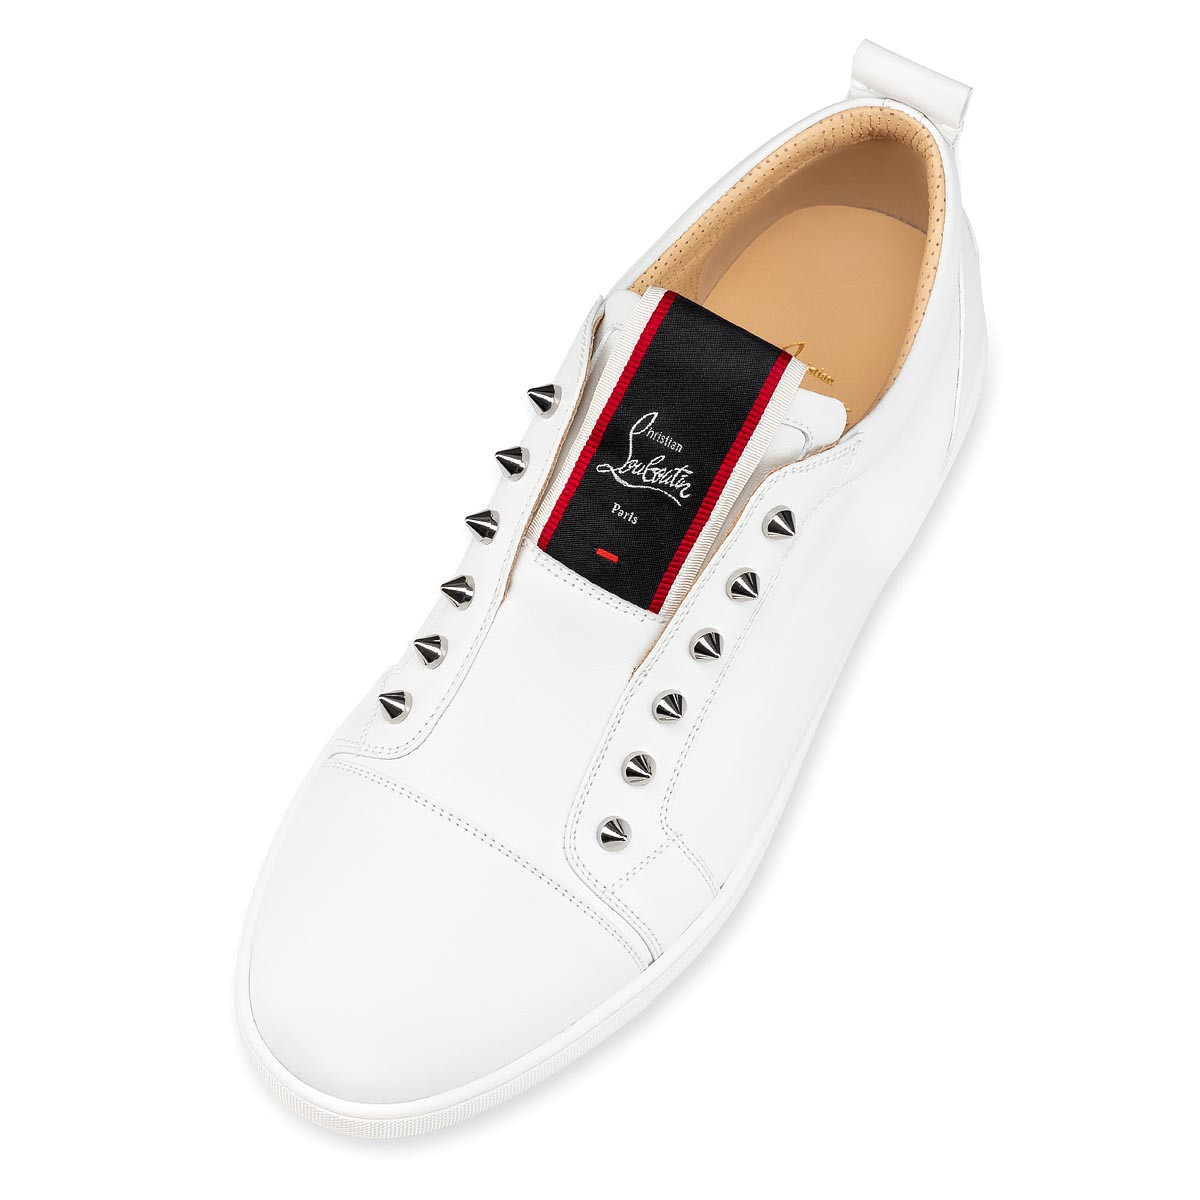 Shoes - F.a.v Fique A Vontade Flat - Christian Louboutin